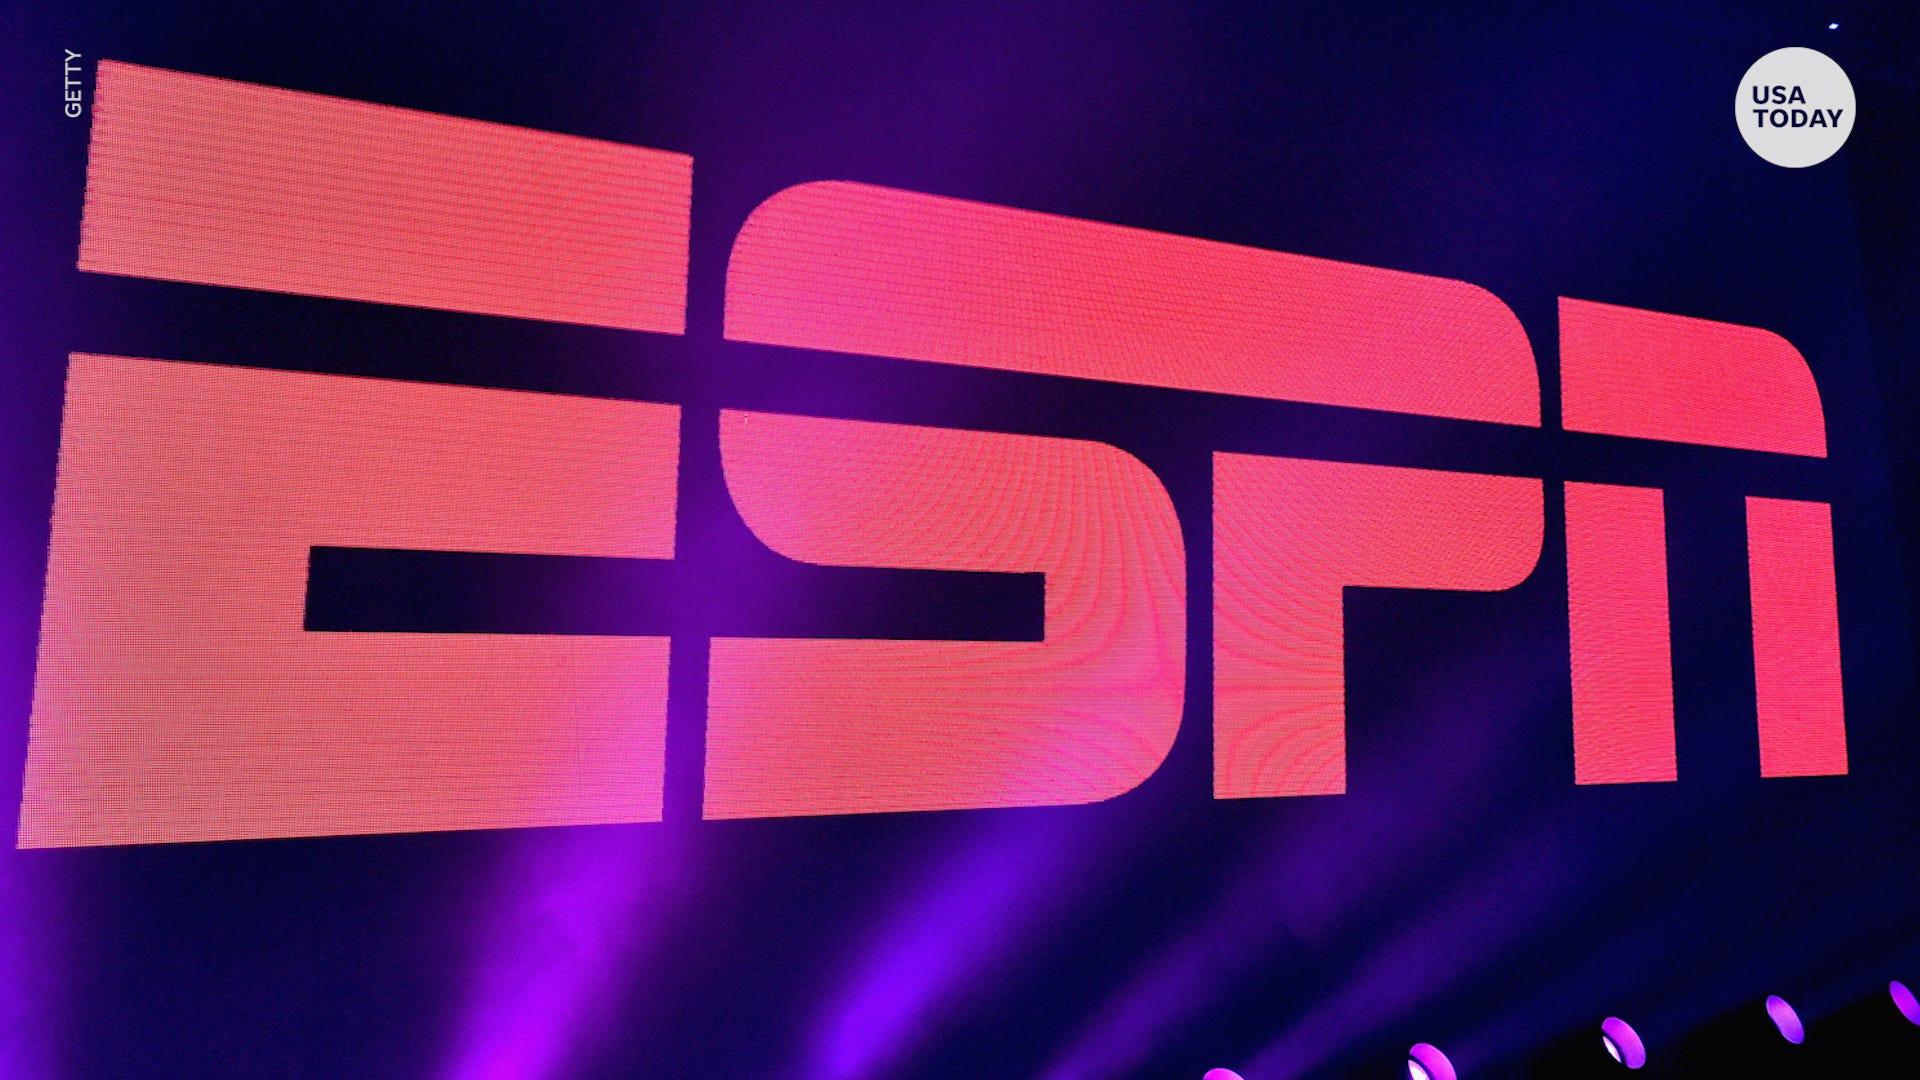 Dan Le Batard speaks out against 'send her back' chant despite ESPN rules